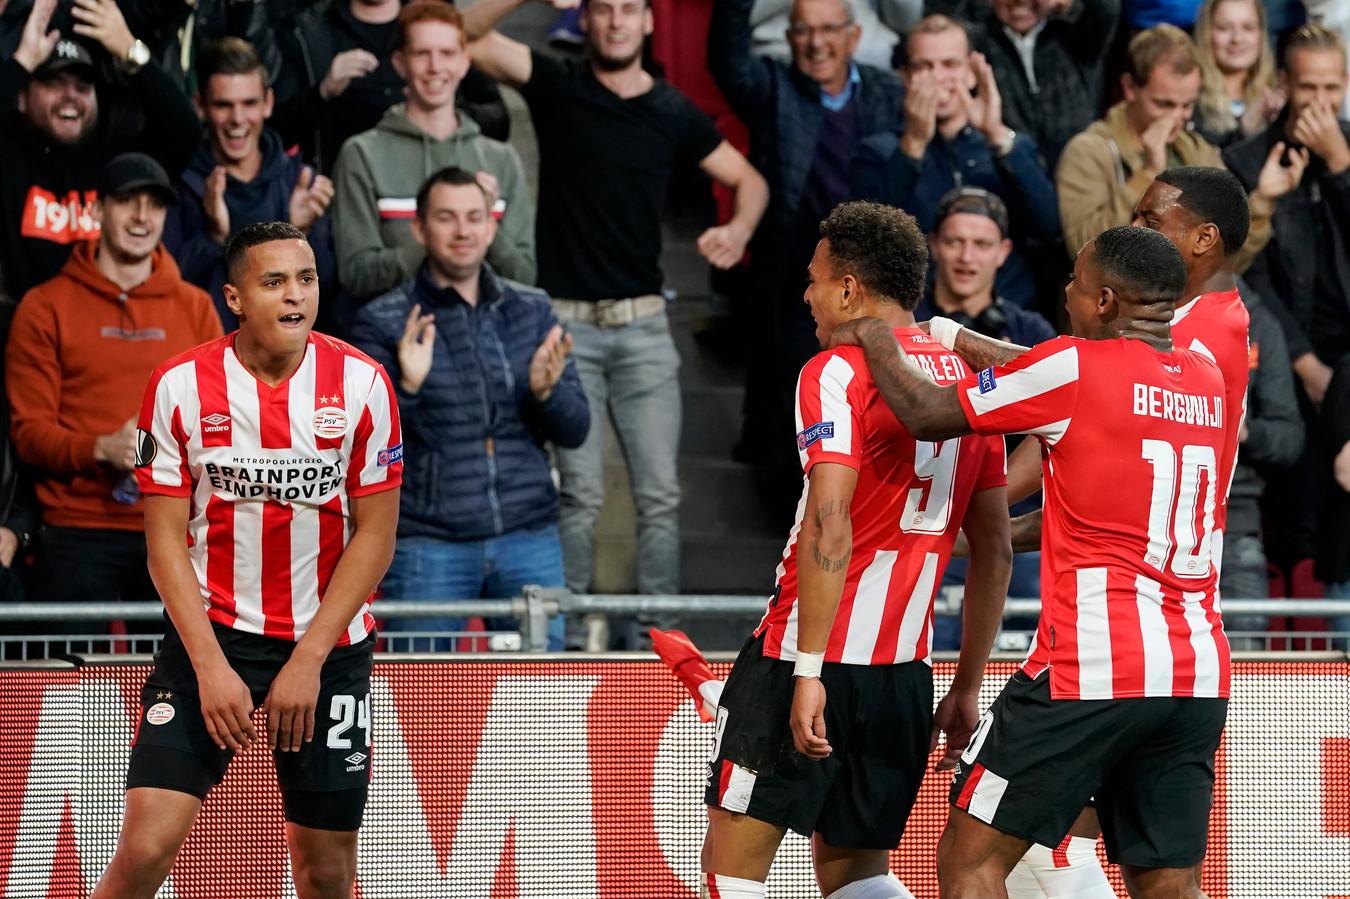 PSV-talenten Mohamed Ihattaren, Donyell Malen, Steven Bergwijn en Pablo Rosario vieren de 1-0 tegen Sporting.